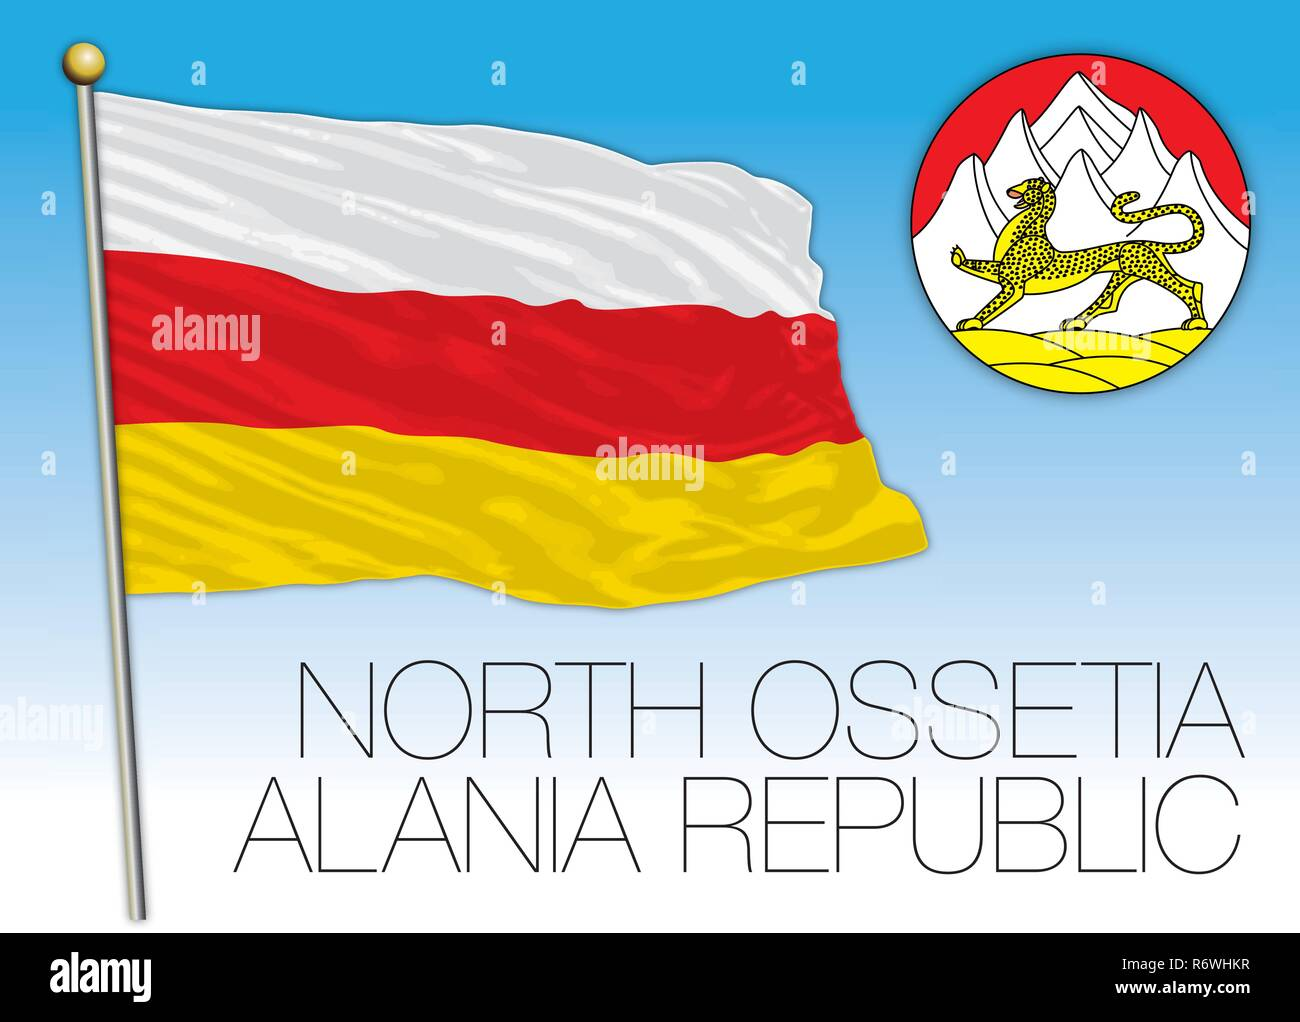 North Ossetia Alania Republic flag, Russian Federation, vector illustration - Stock Image